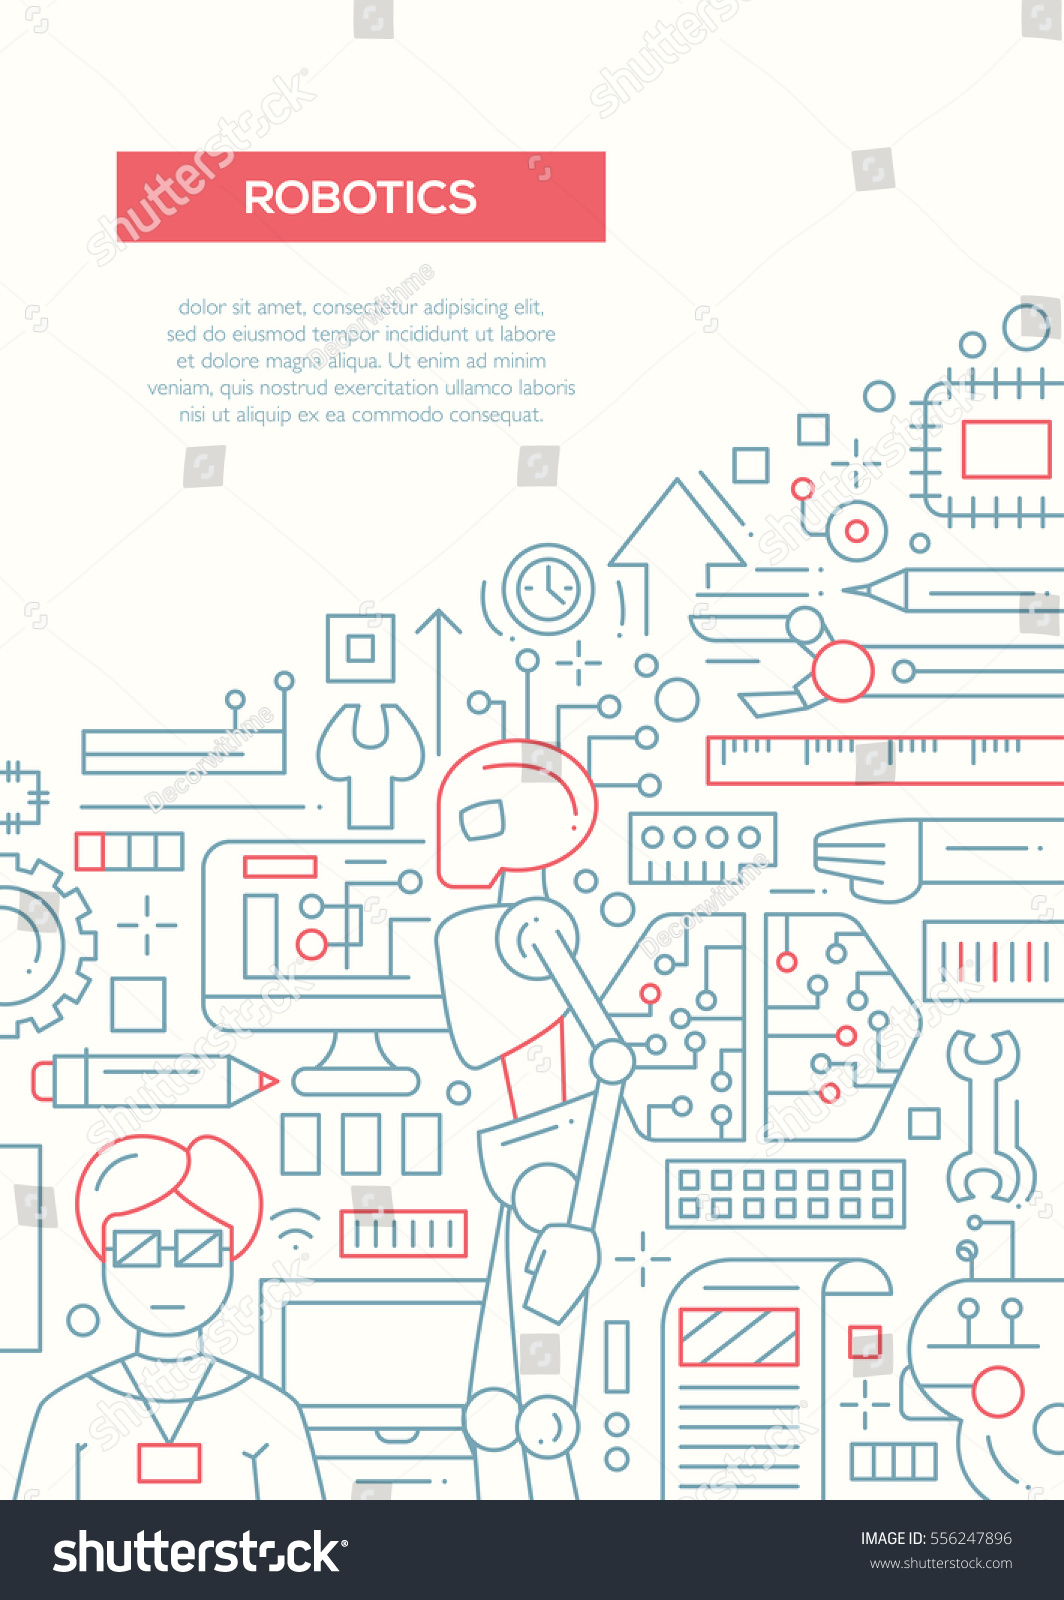 robotics plain line design brochure poster stock illustration